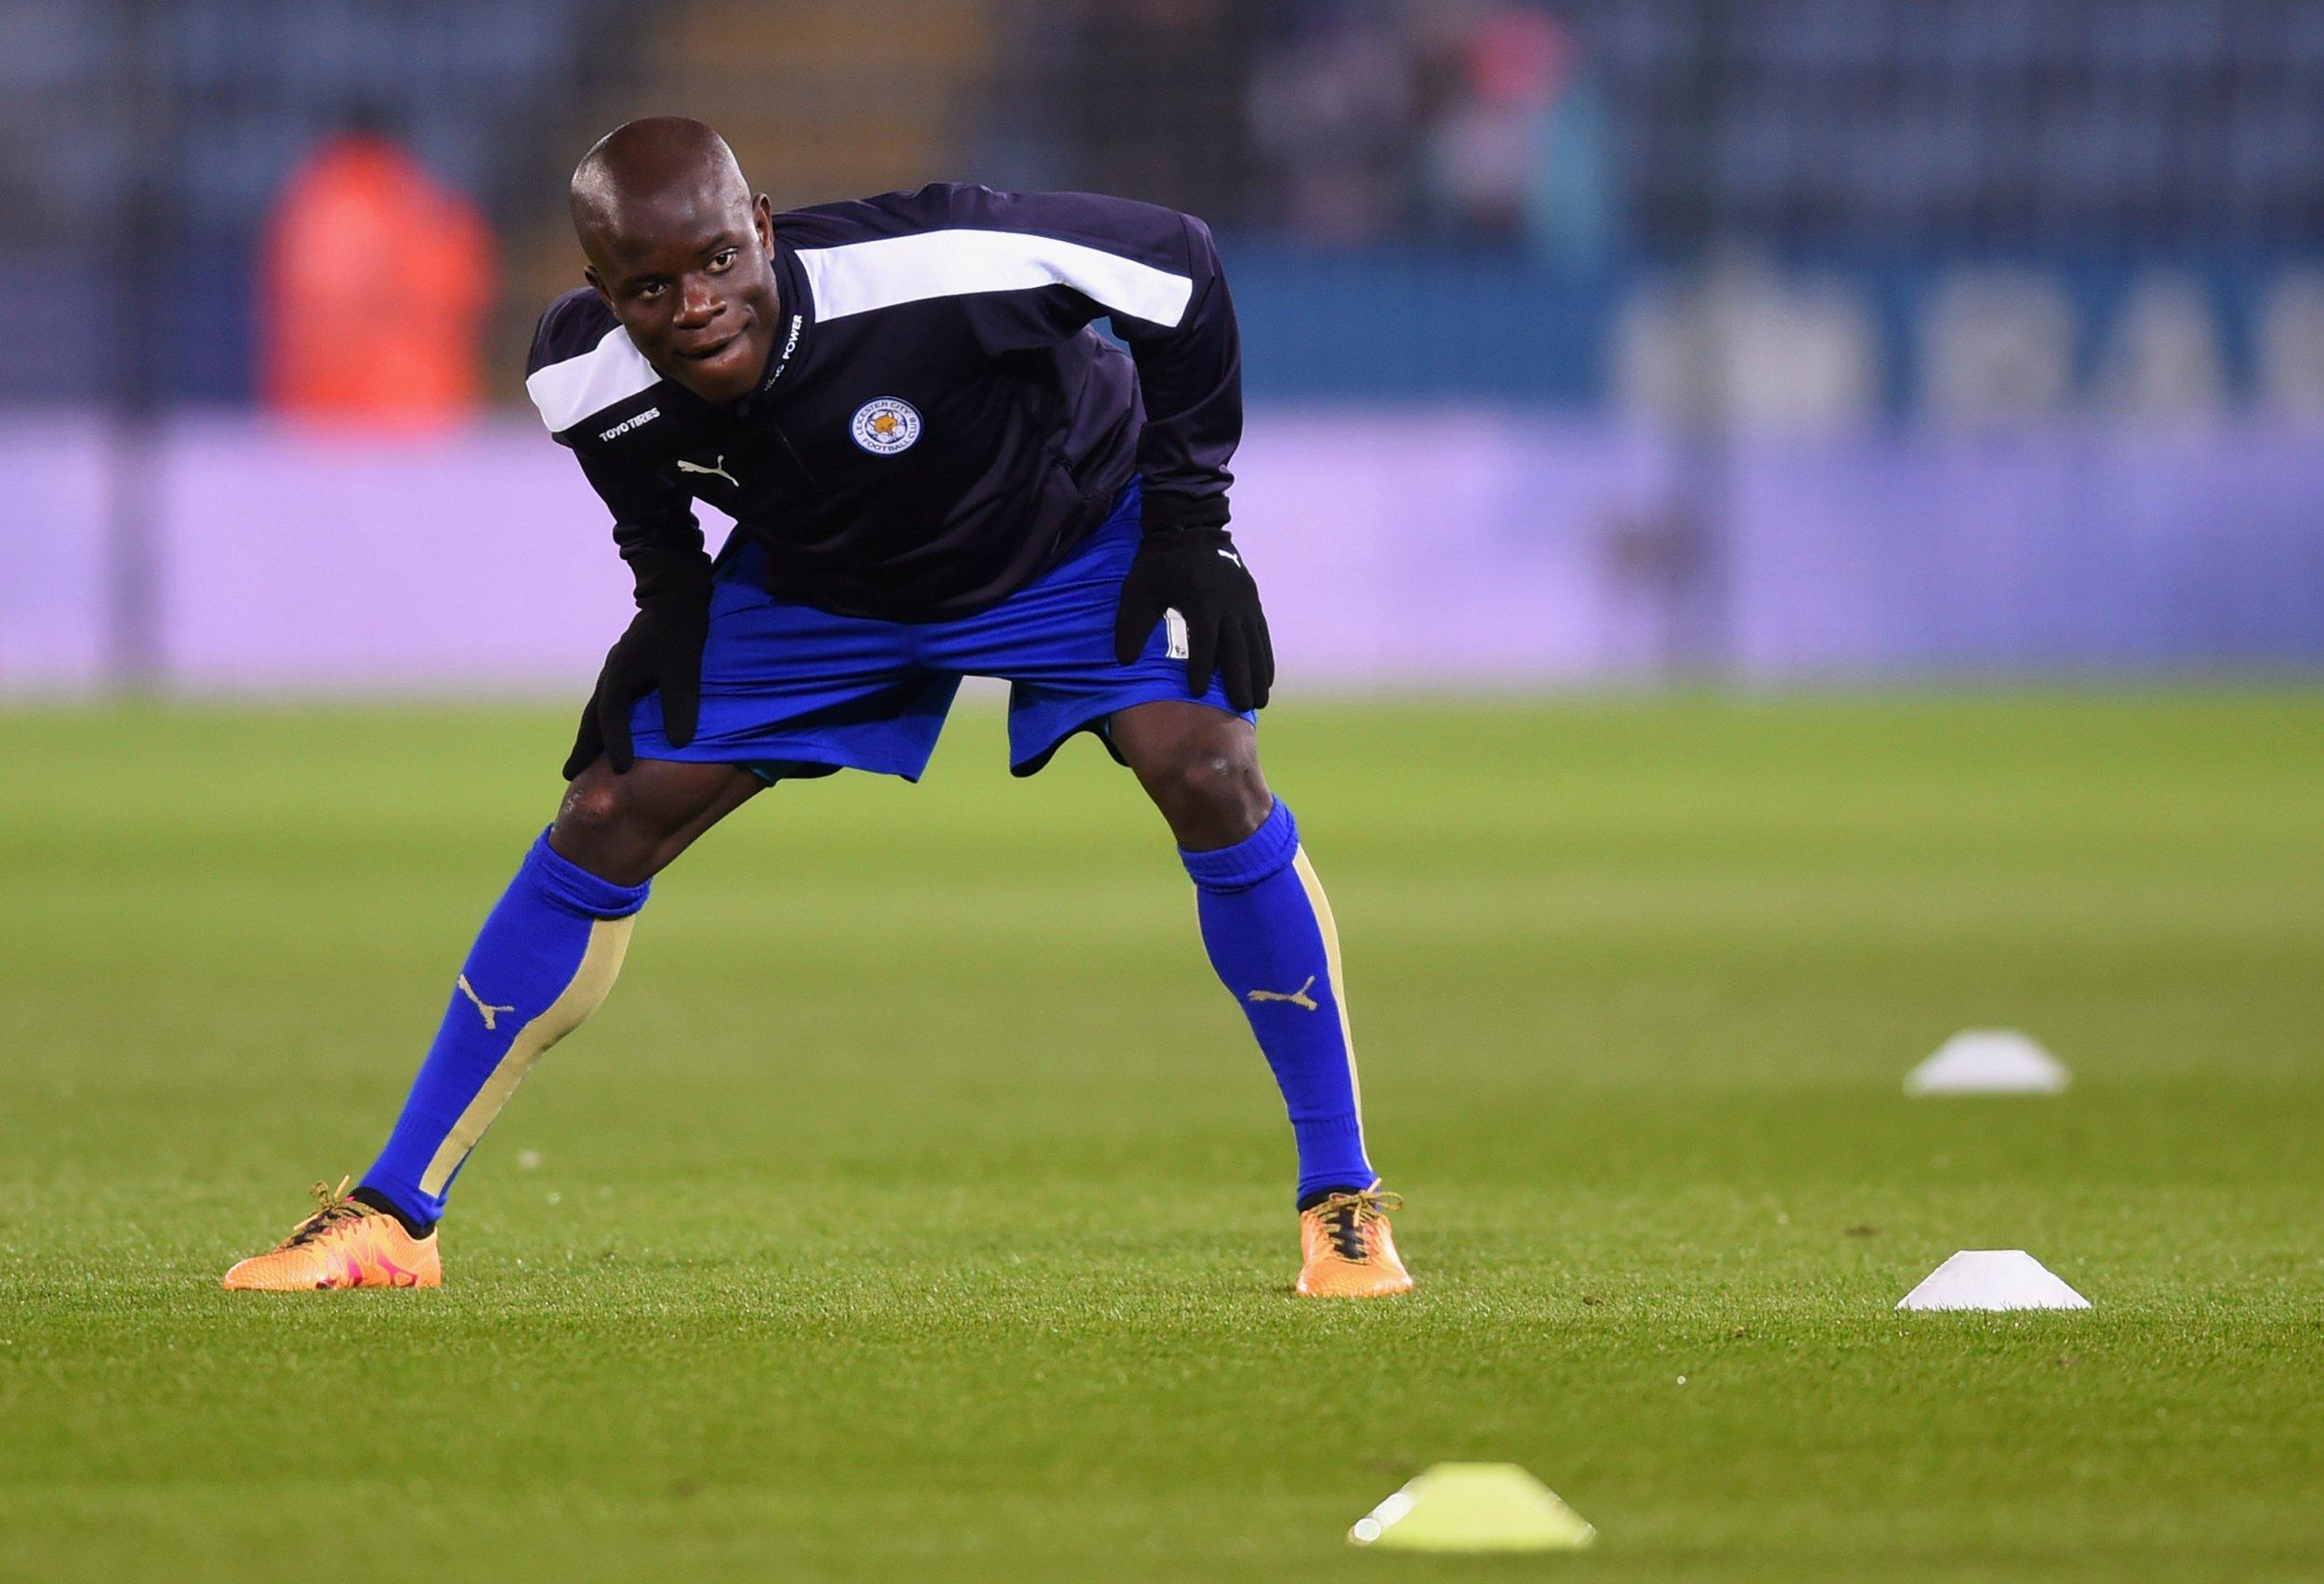 Leicester City midfielder N'Golo Kante